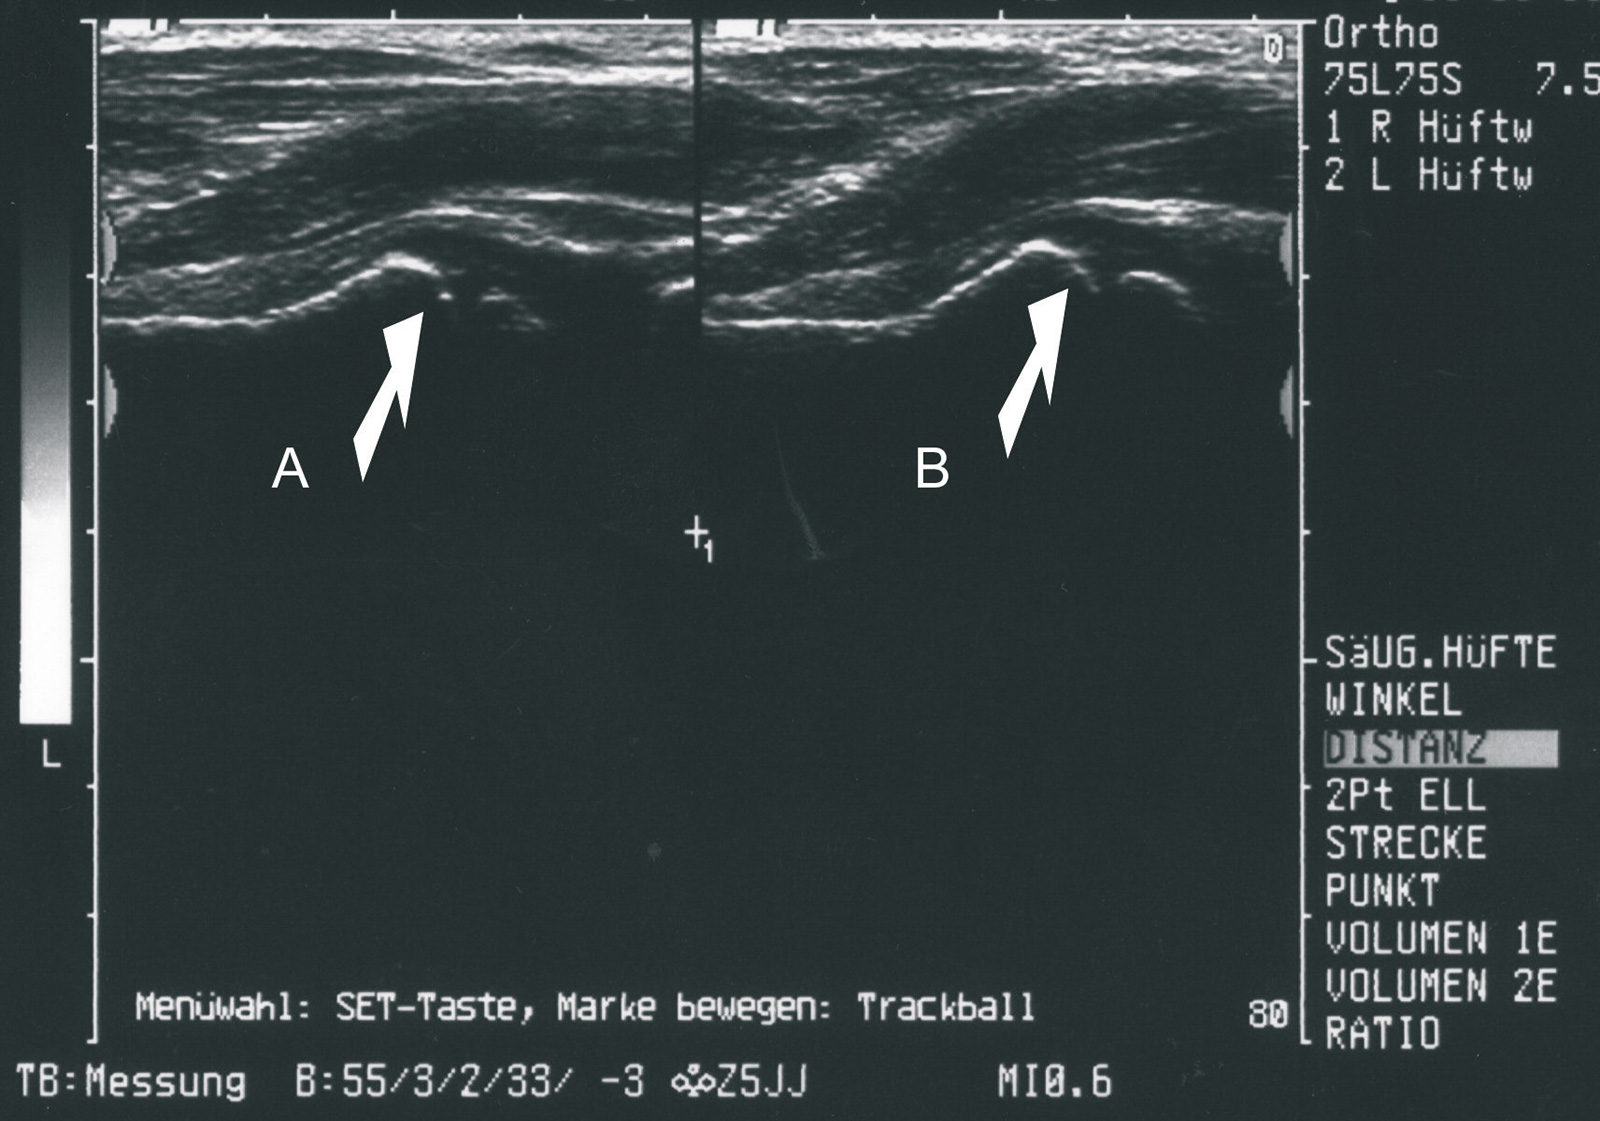 Abb. 4-28: Ultraschall zum Ausschluss eines Hüftgelenksergusses, Vergleich zur Gegenseite